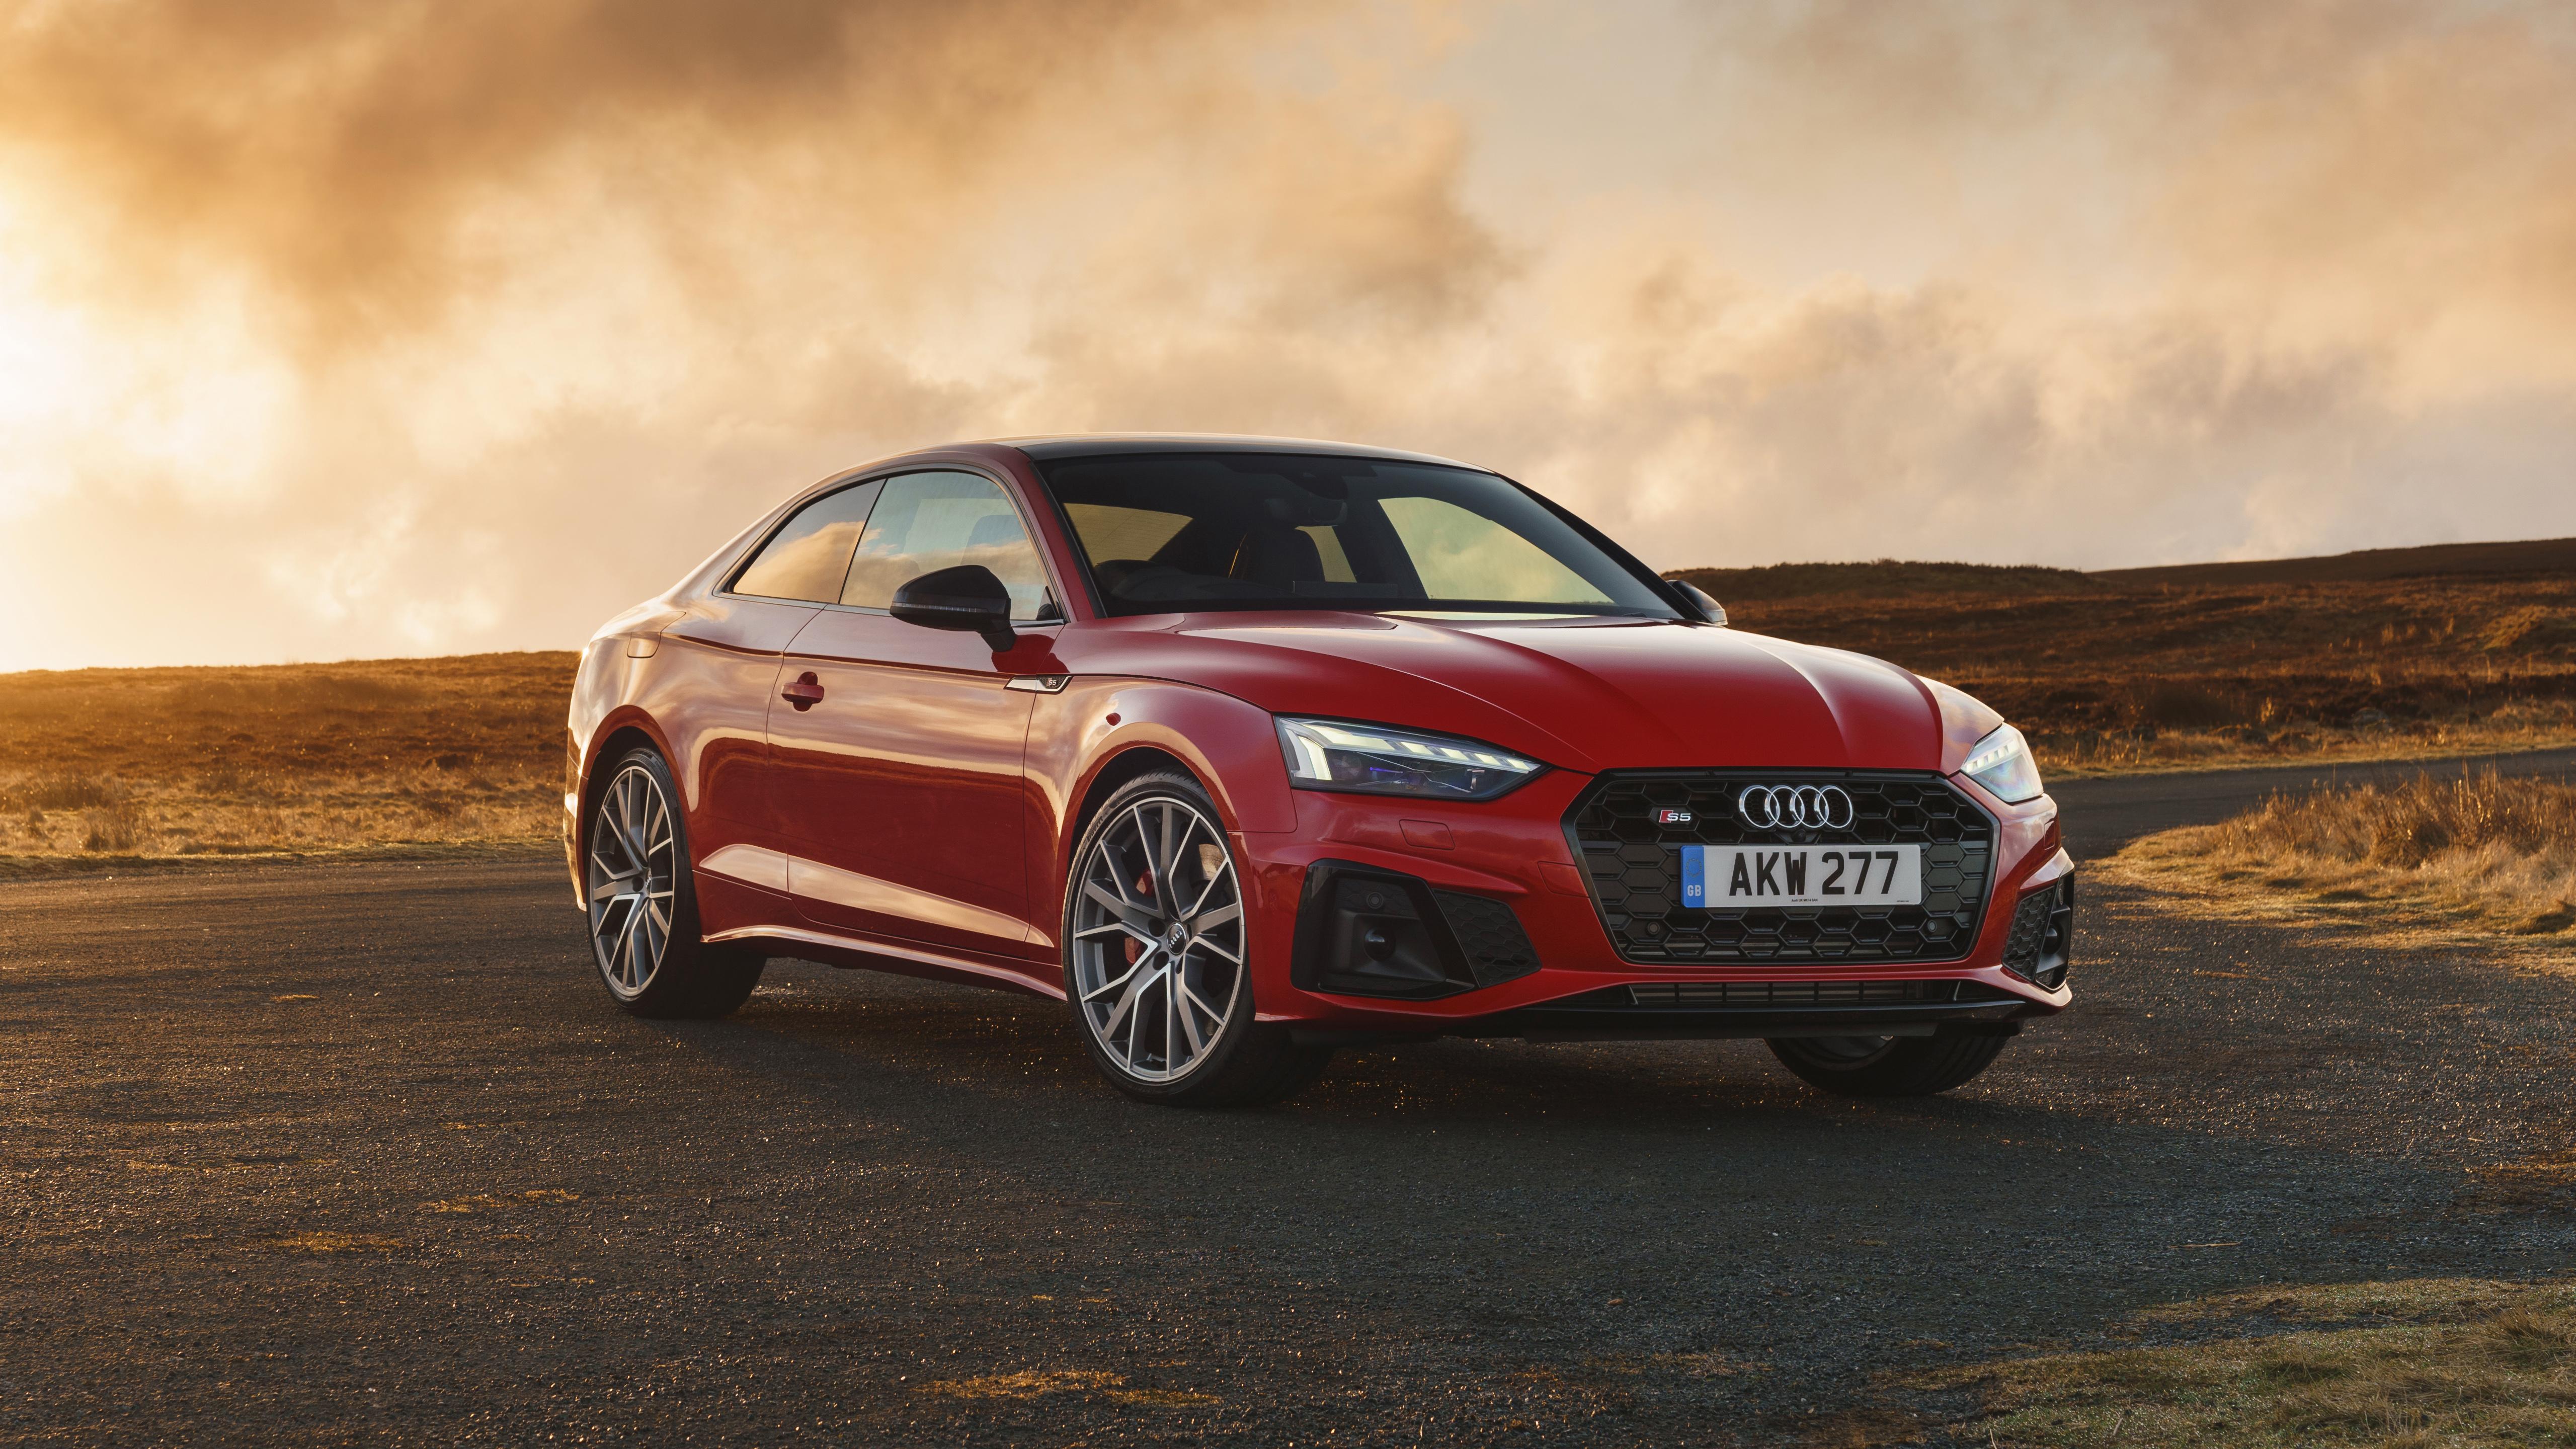 Audi S5 Coupe Tdi 2020 5k Wallpaper Hd Car Wallpapers Id 15516